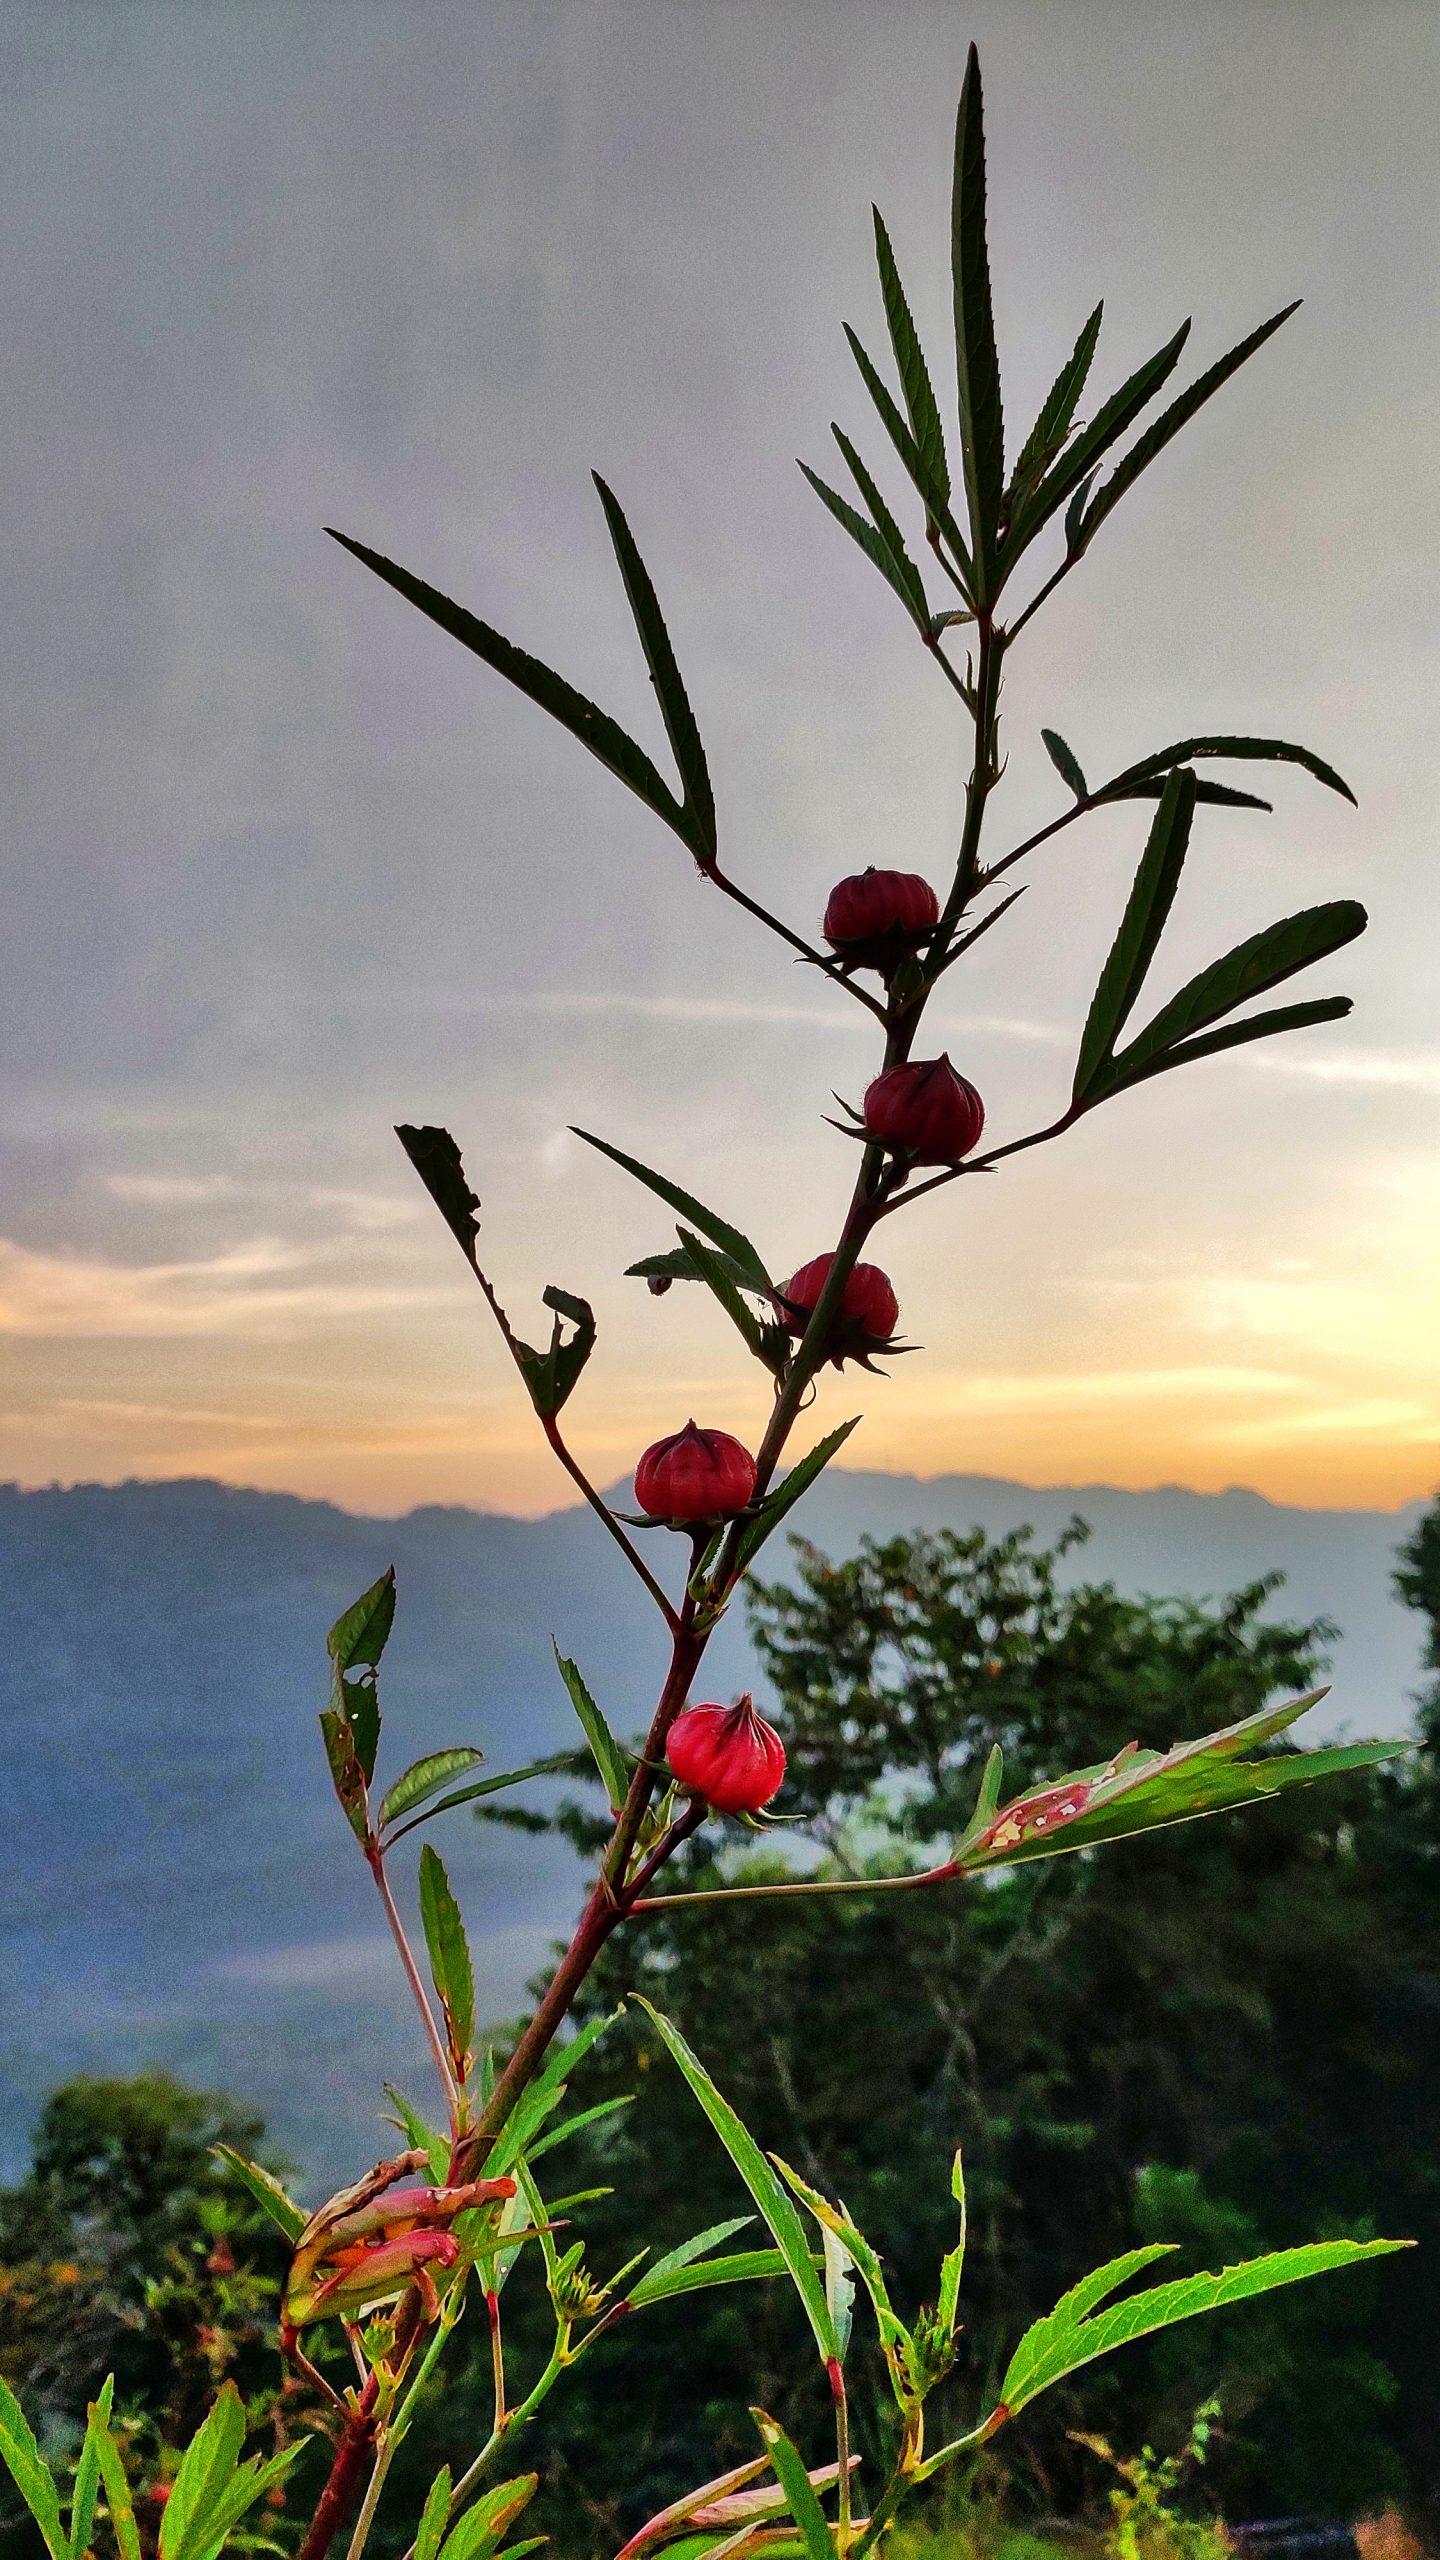 Flower buds with beautiful sky